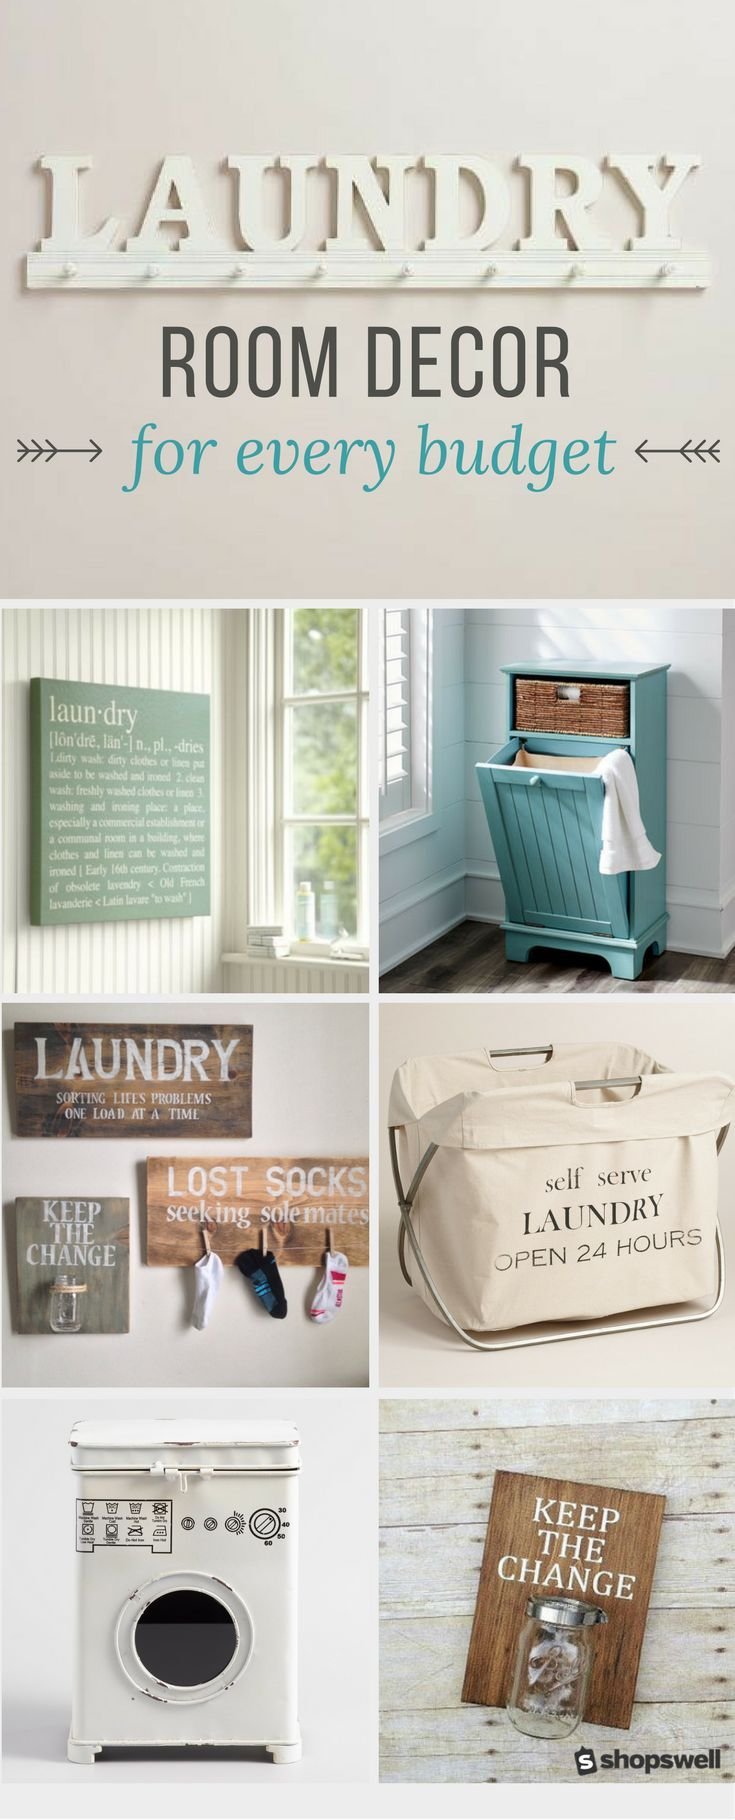 laundry room decor ideas for every budget